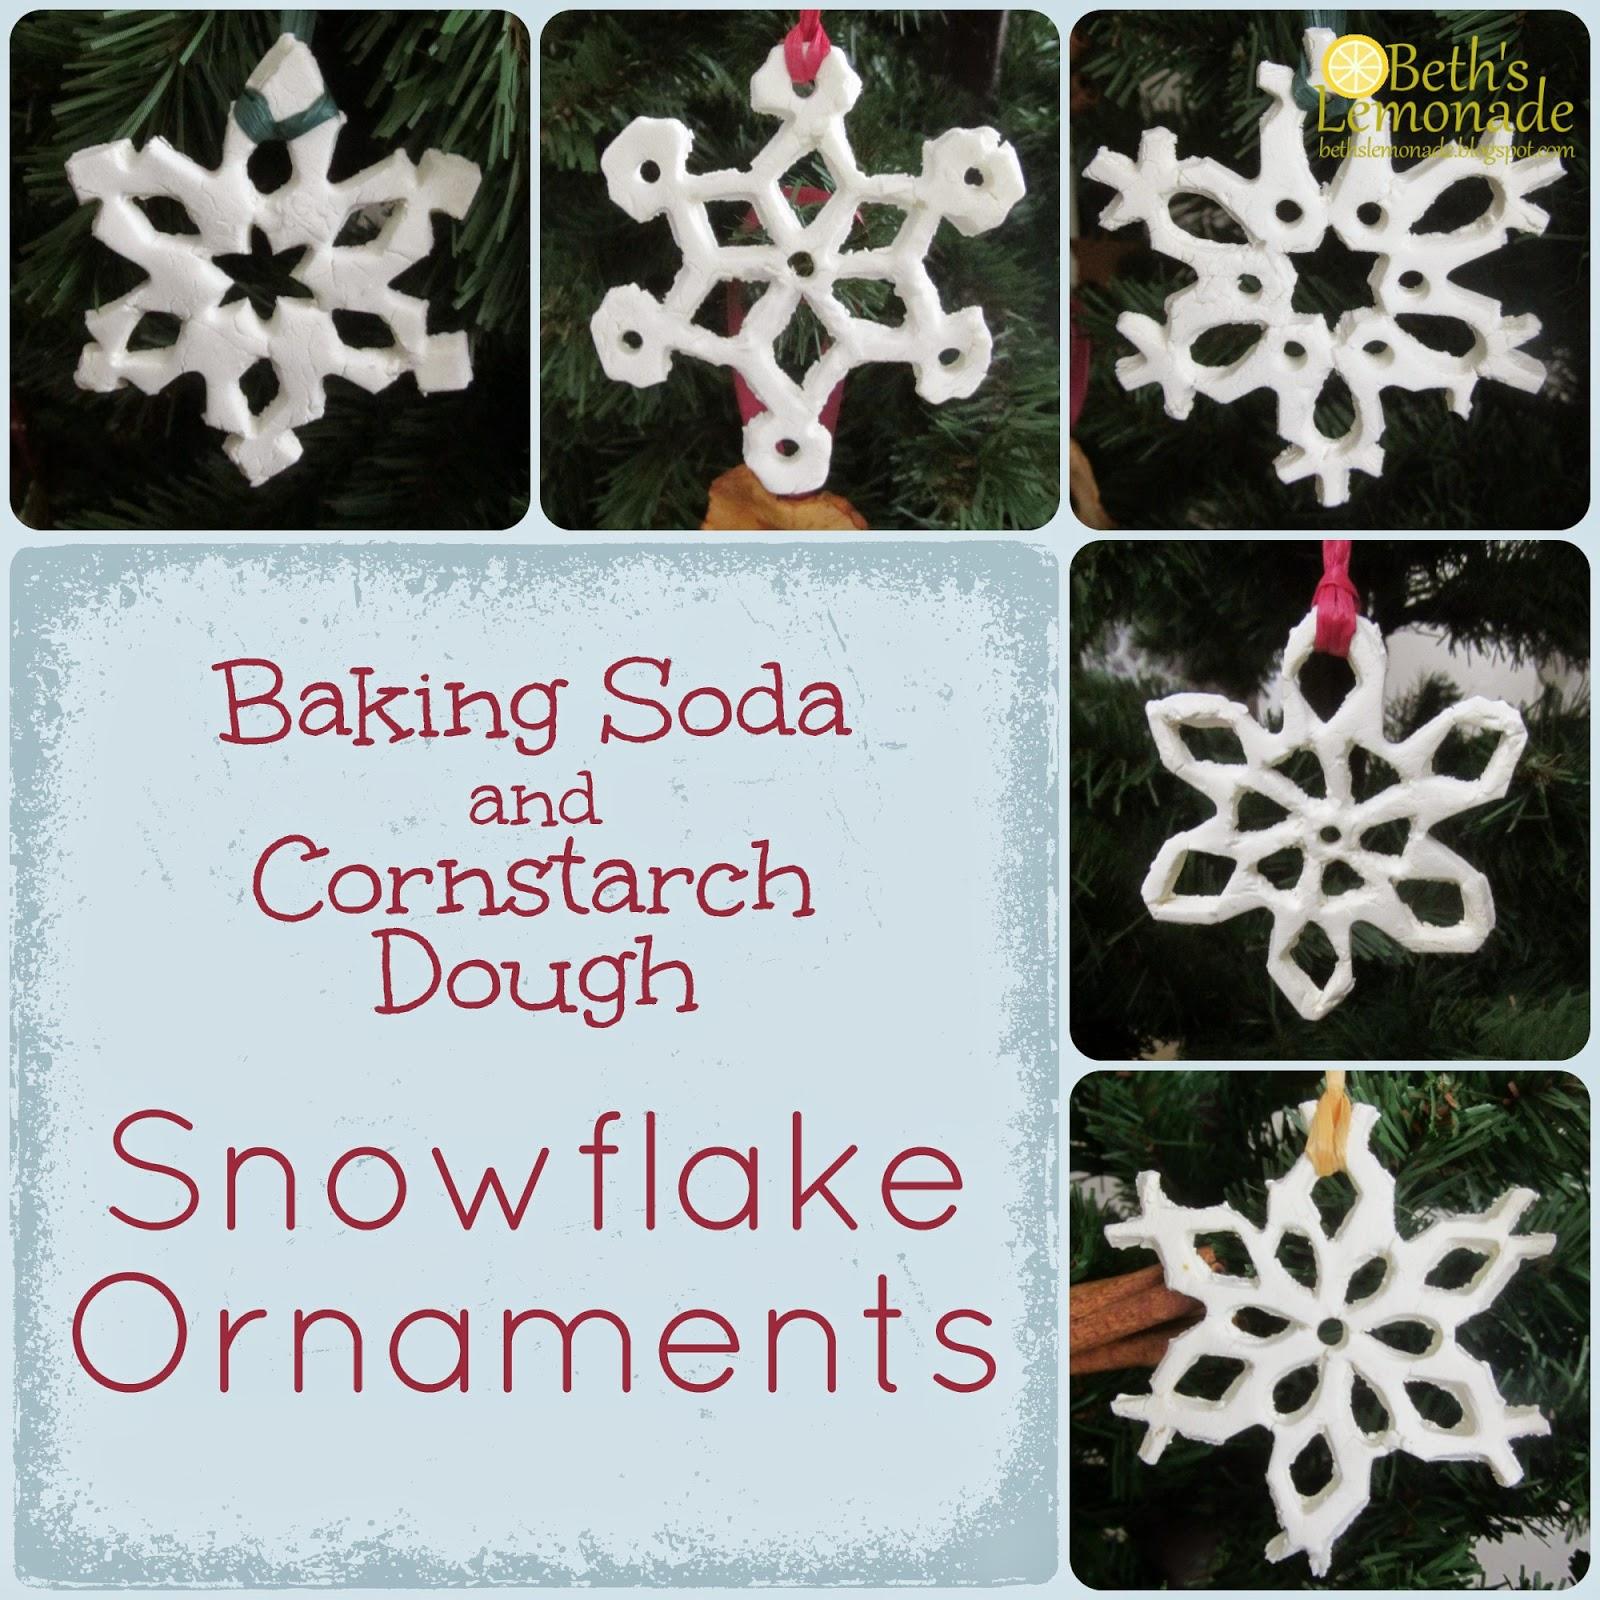 Soda In Christmas Tree Water: Beth's Lemonade: Rustic Homemade Christmas Tree